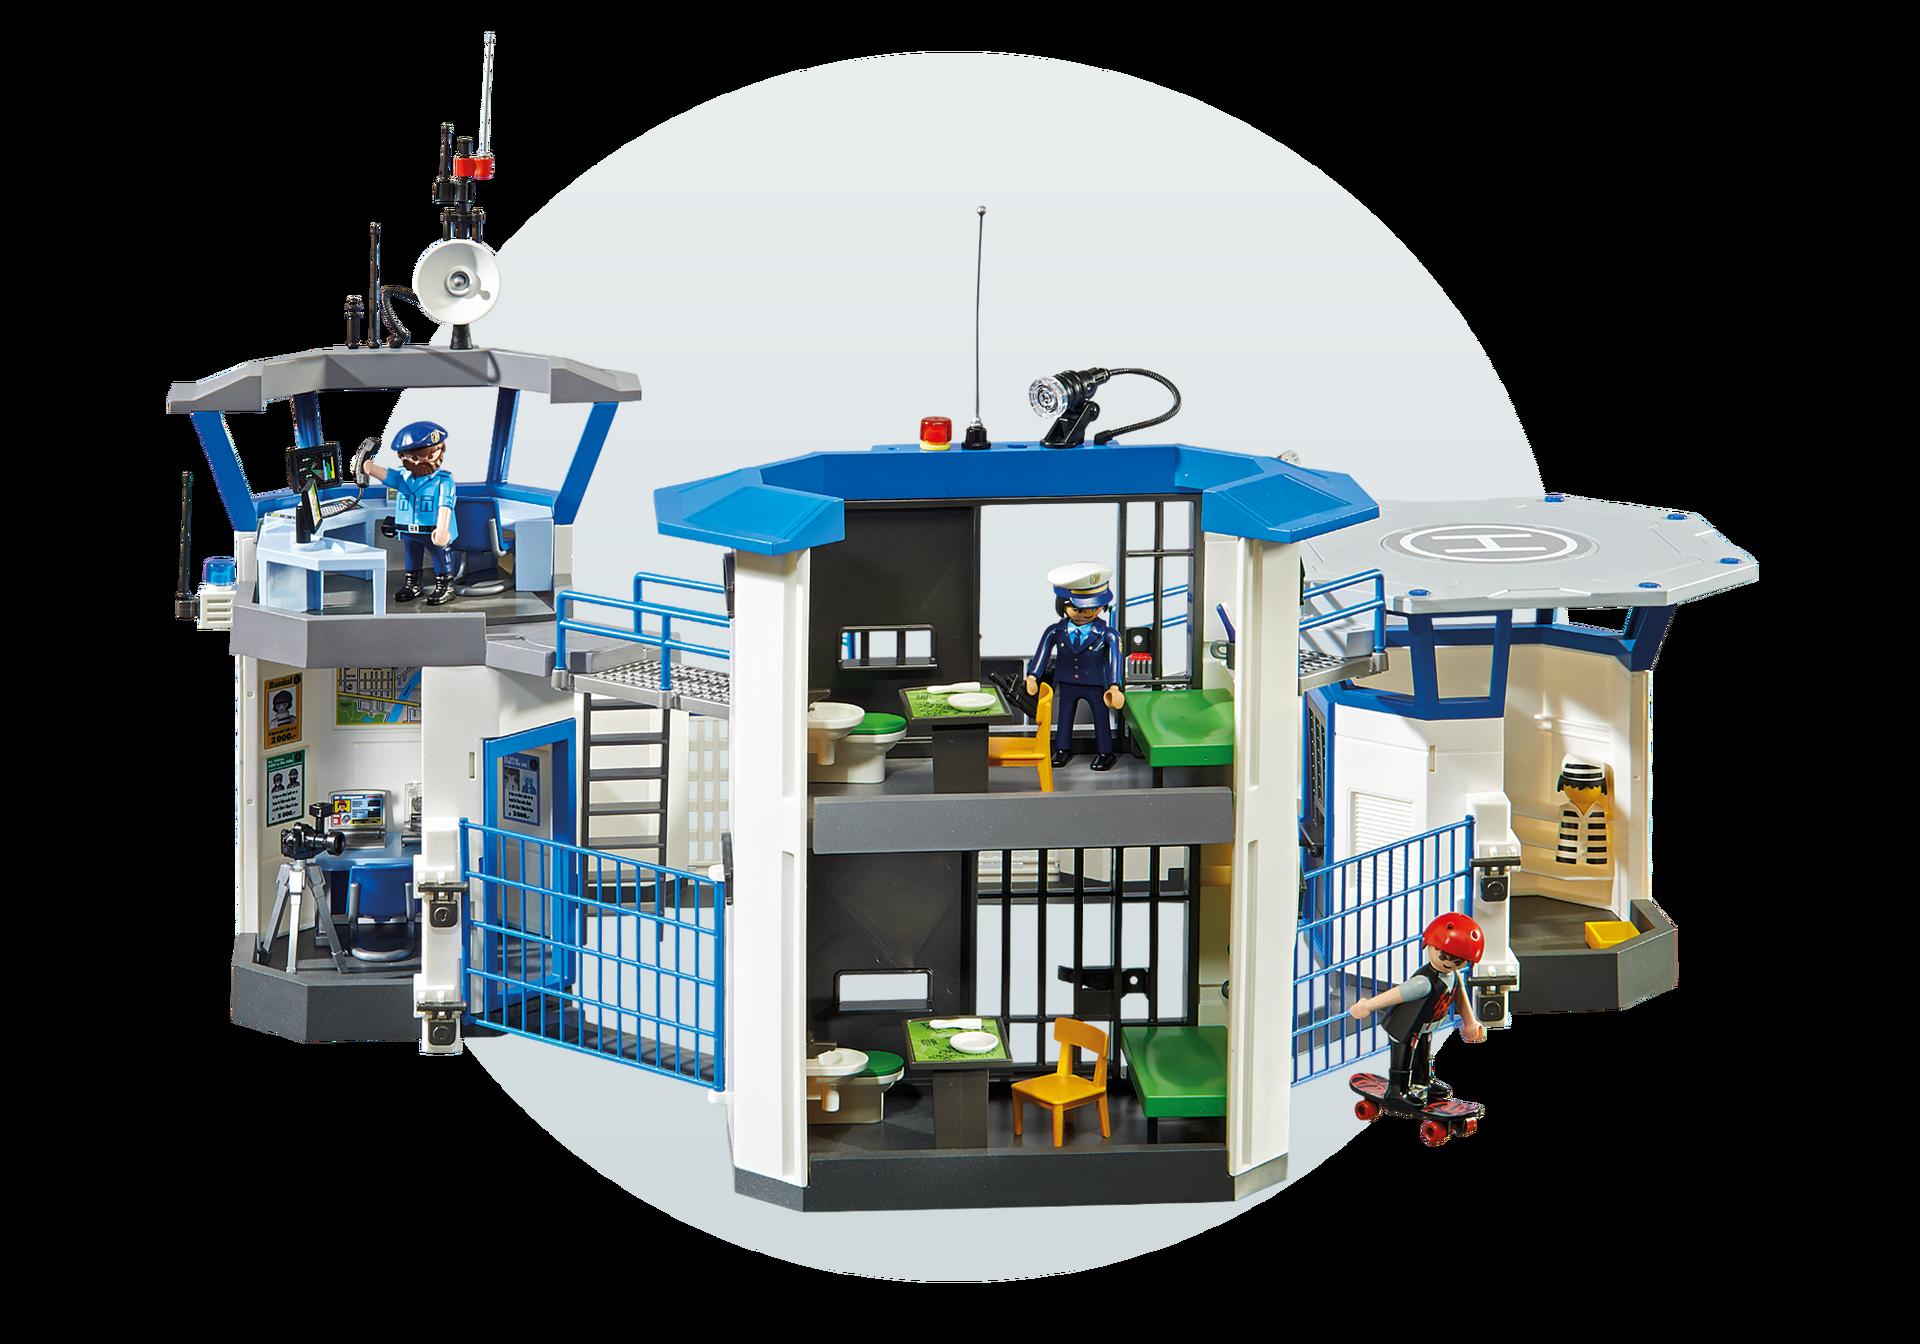 Police Headquarters With Prison 6919 Playmobil United Kingdom